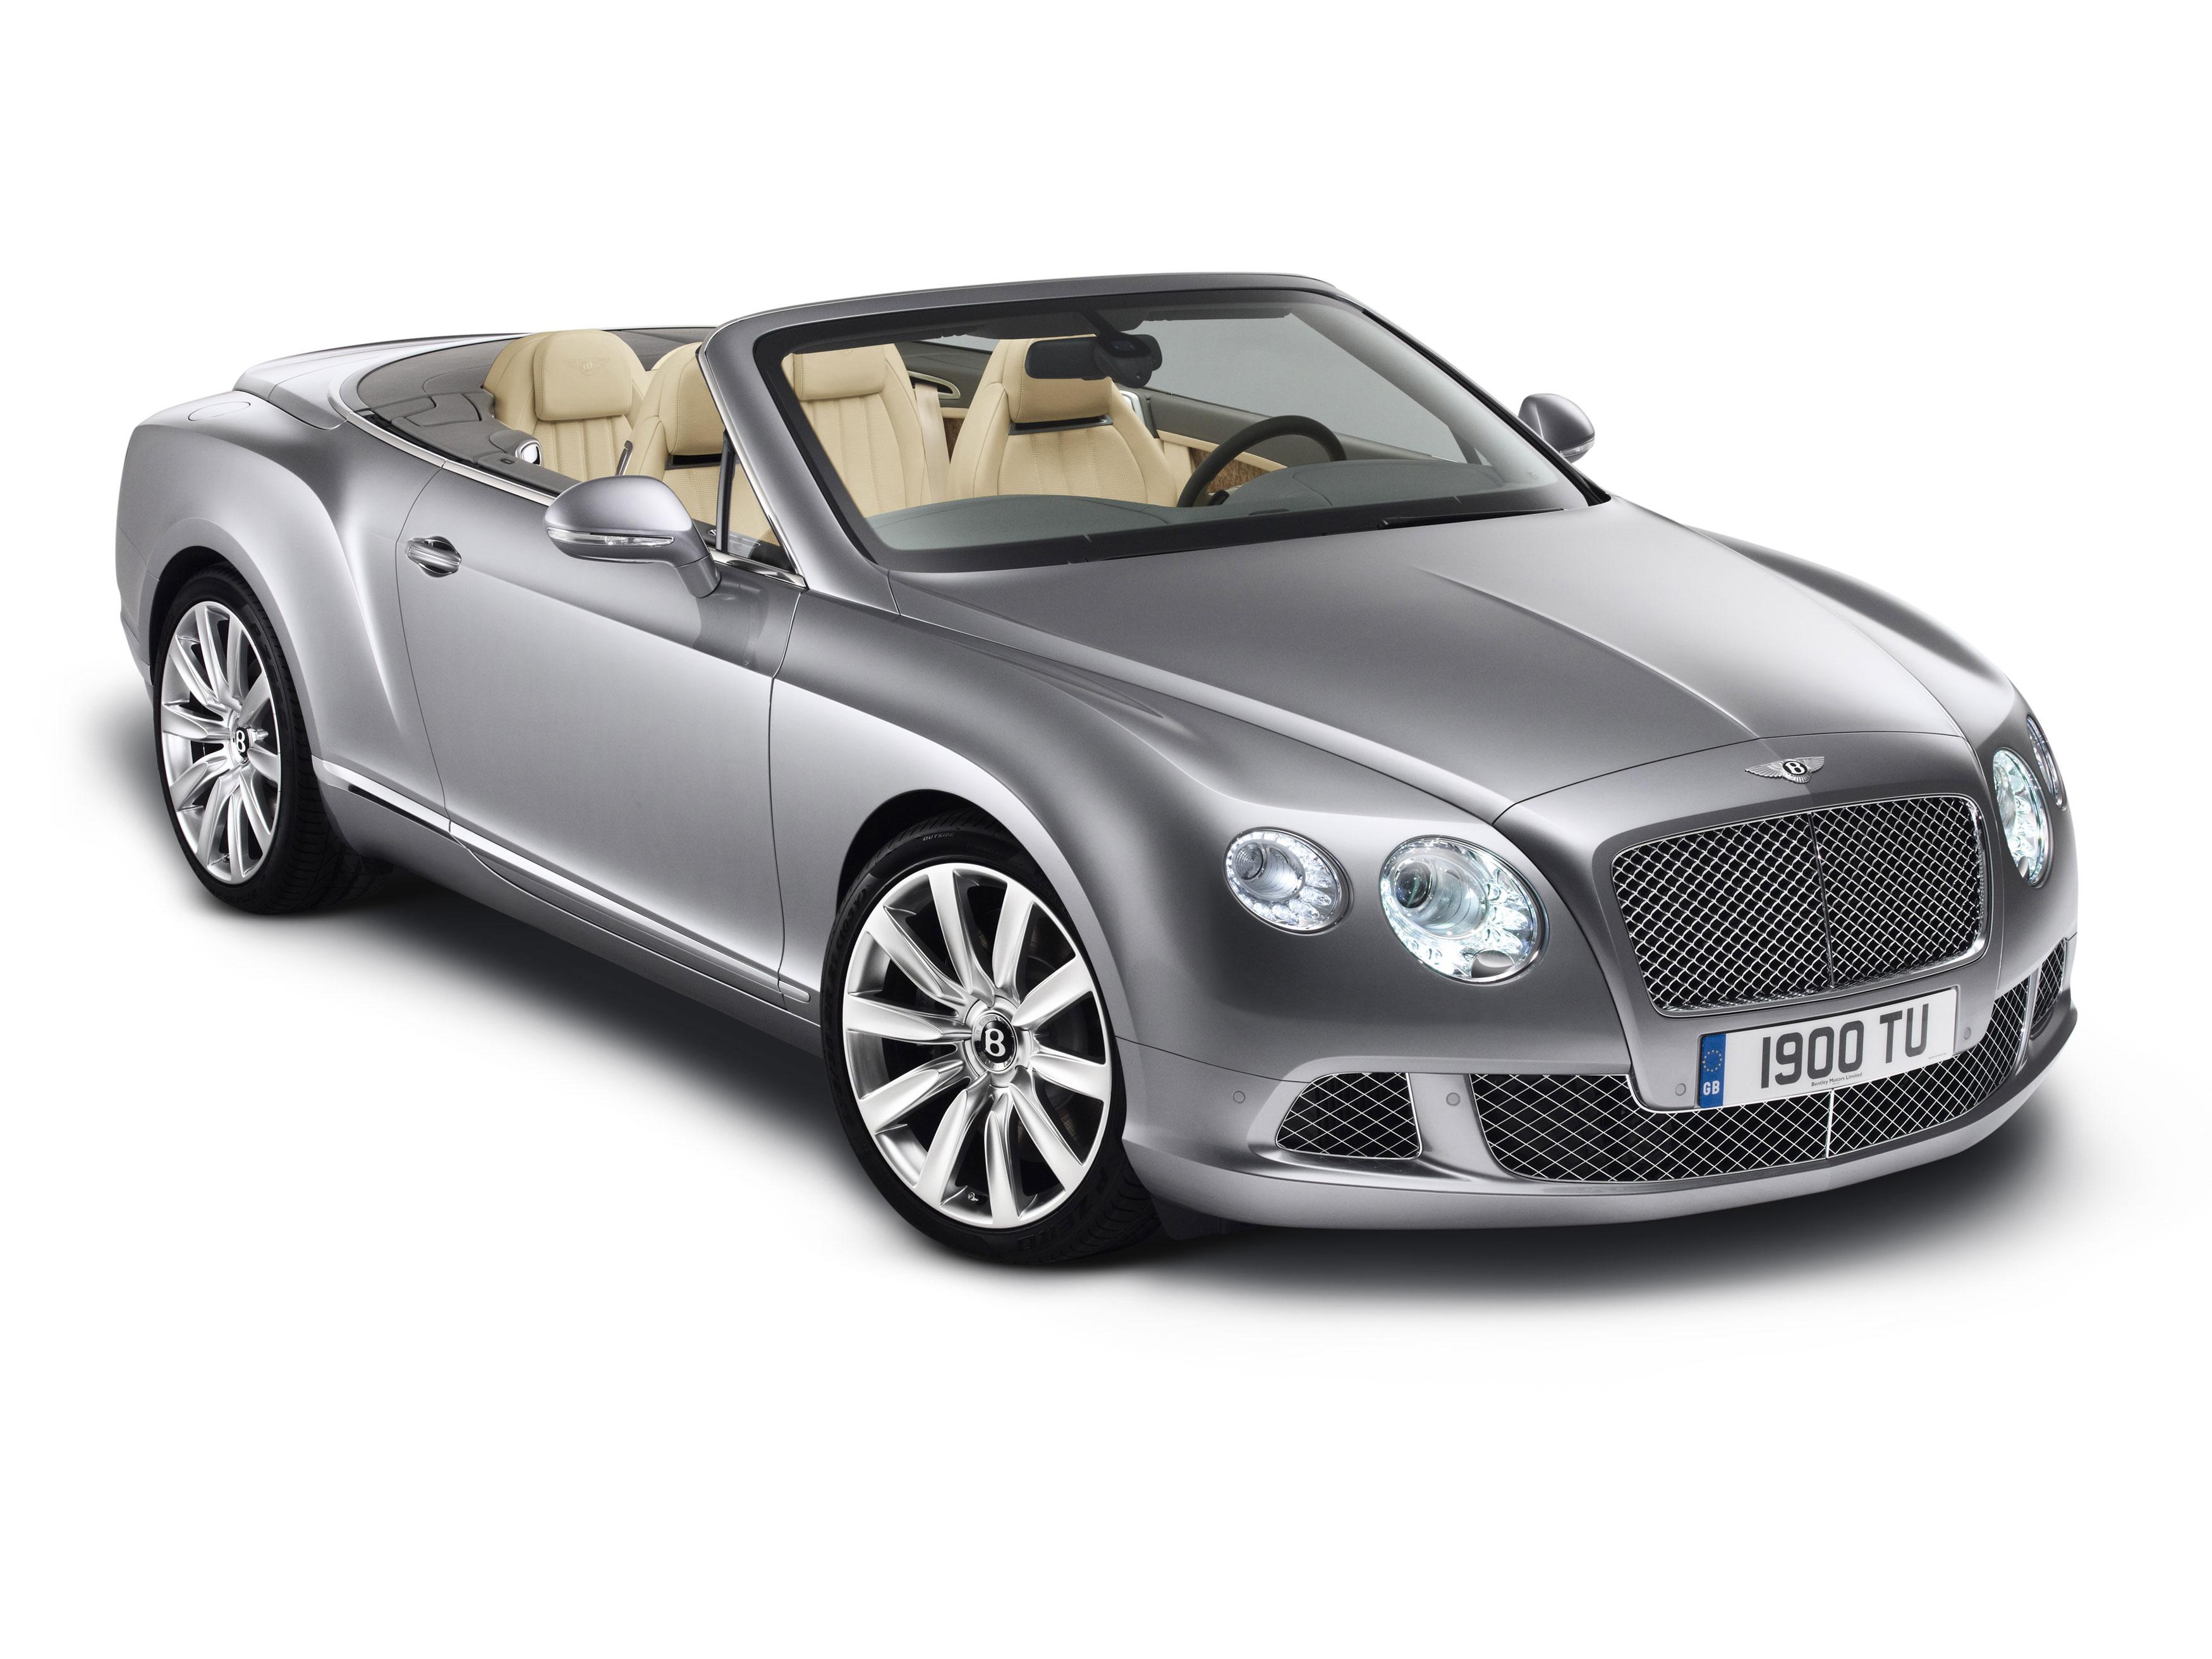 auto review: bentley continental gtc v8 - d magazine